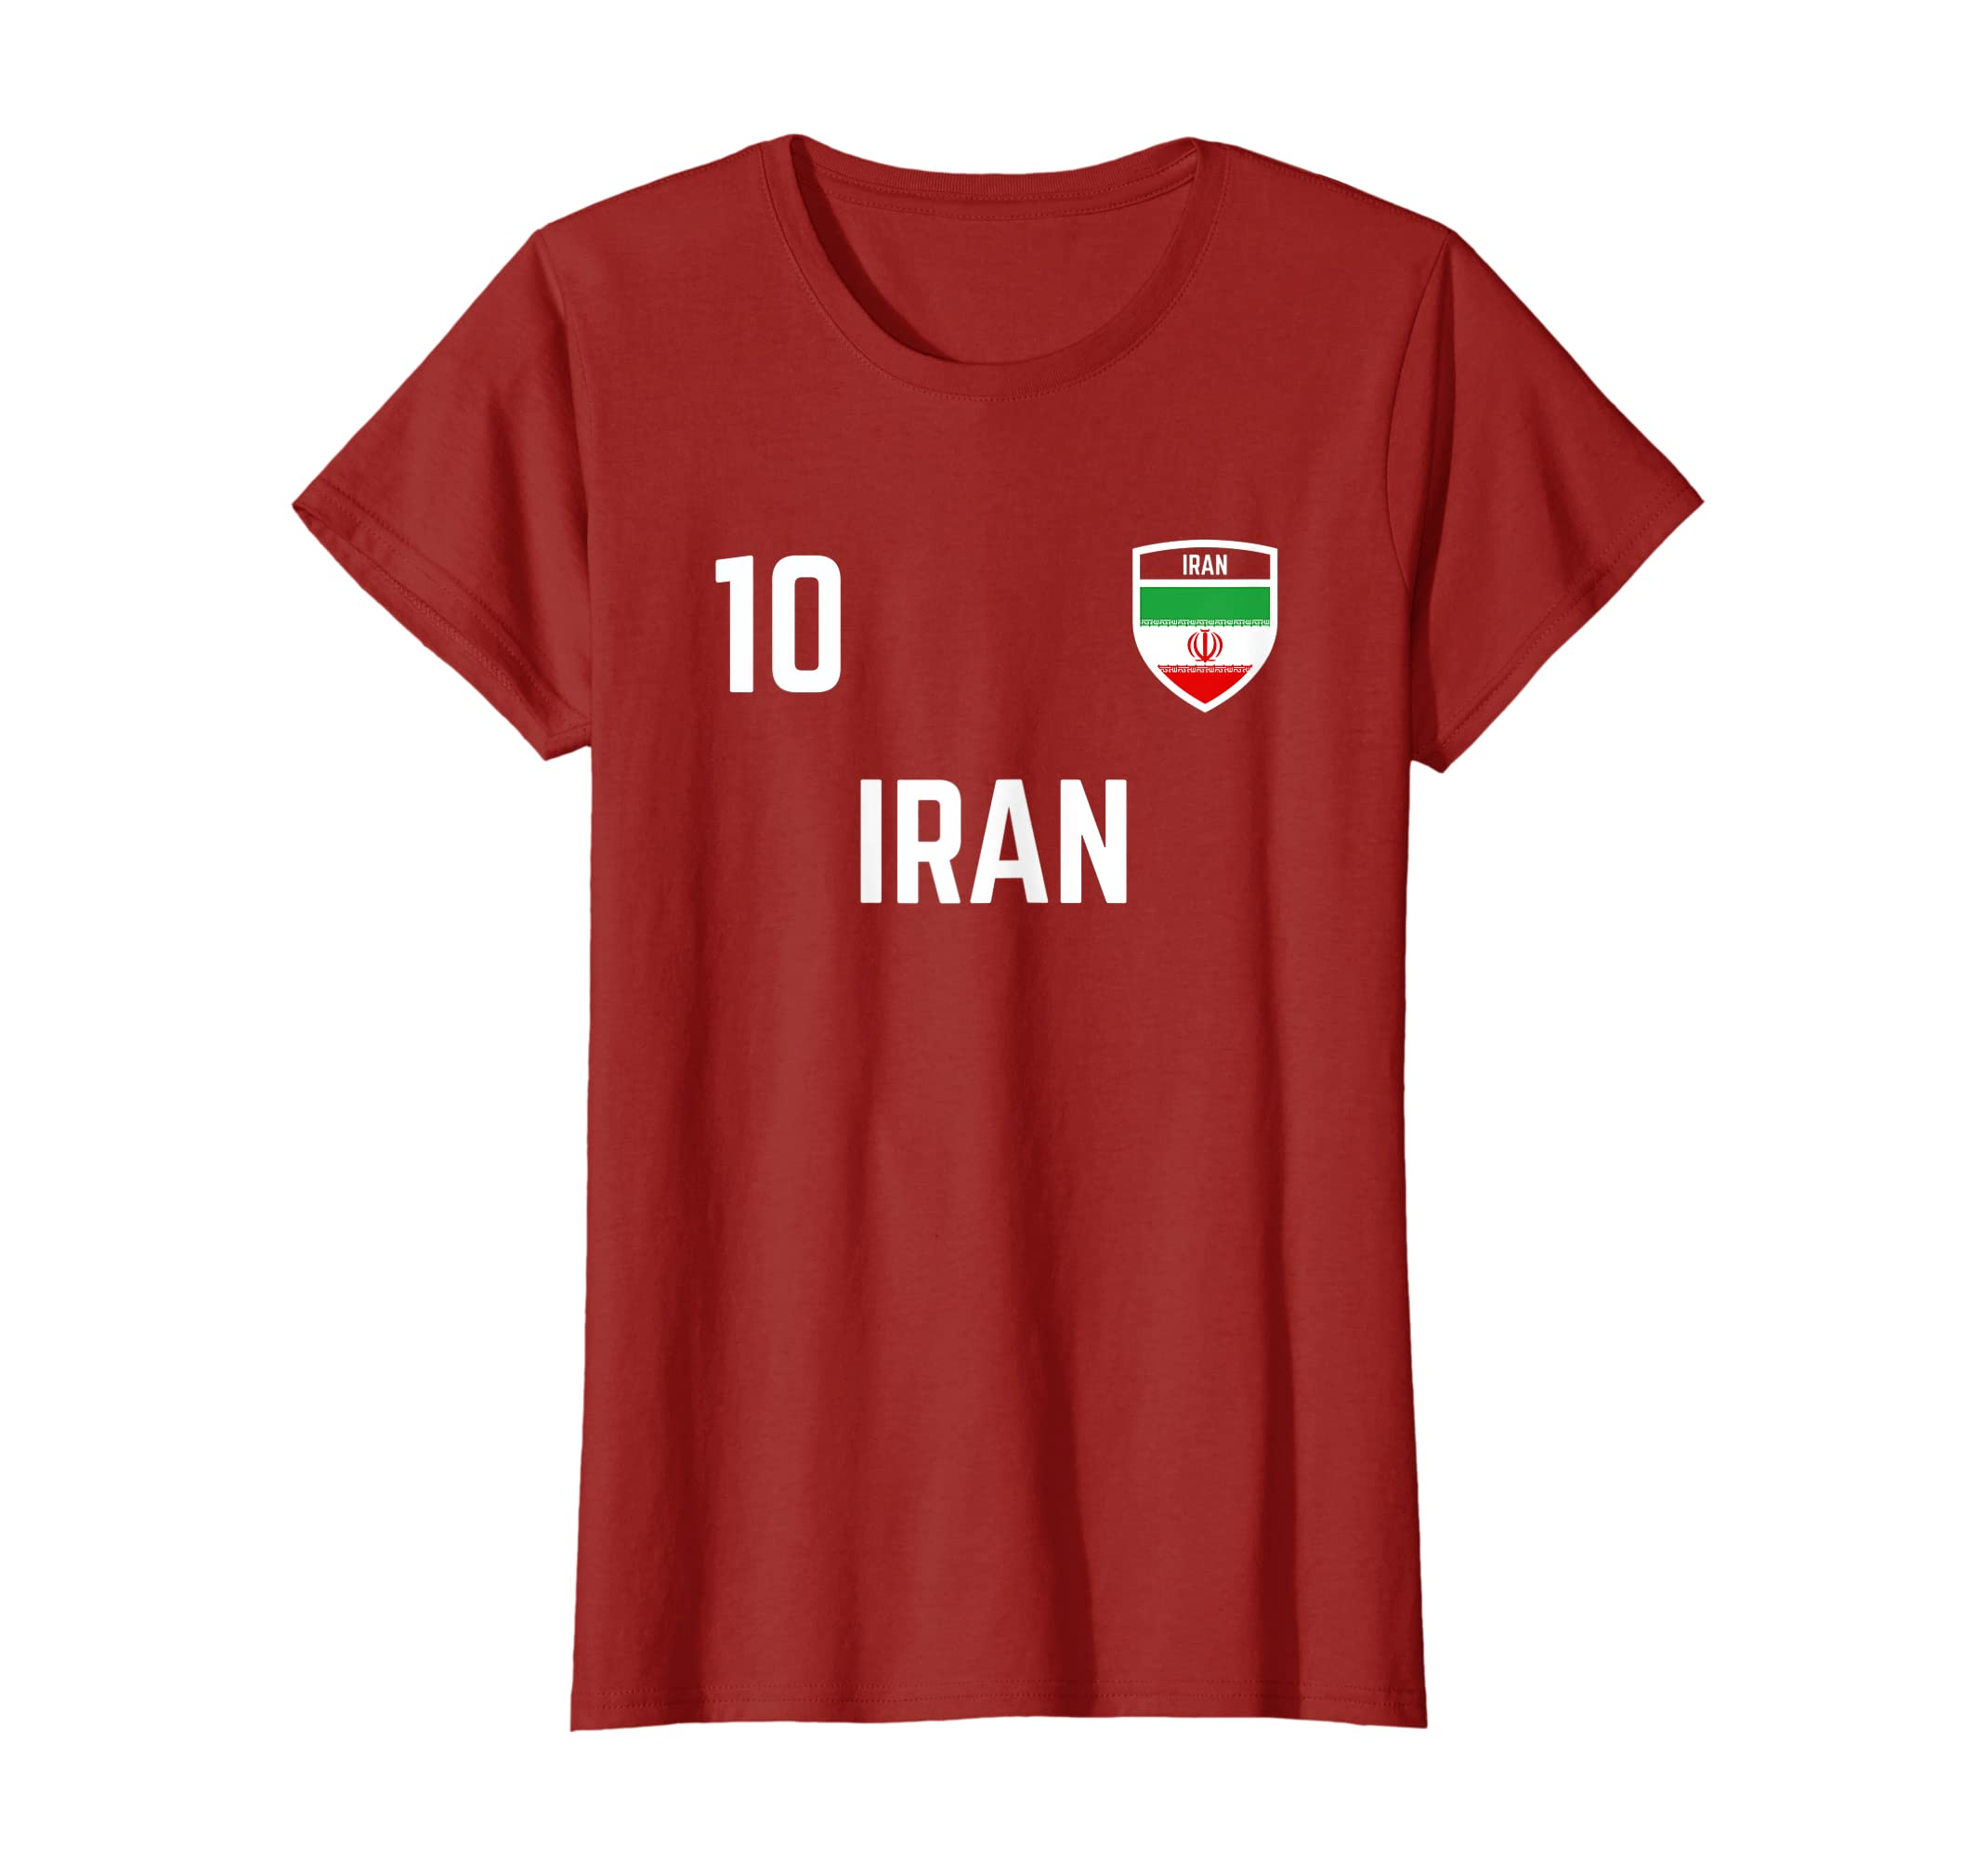 4928c9657b5 Amazon.com  Iran Soccer Jersey 2019 Flag Iranian Football Team Fan Shirt   Clothing